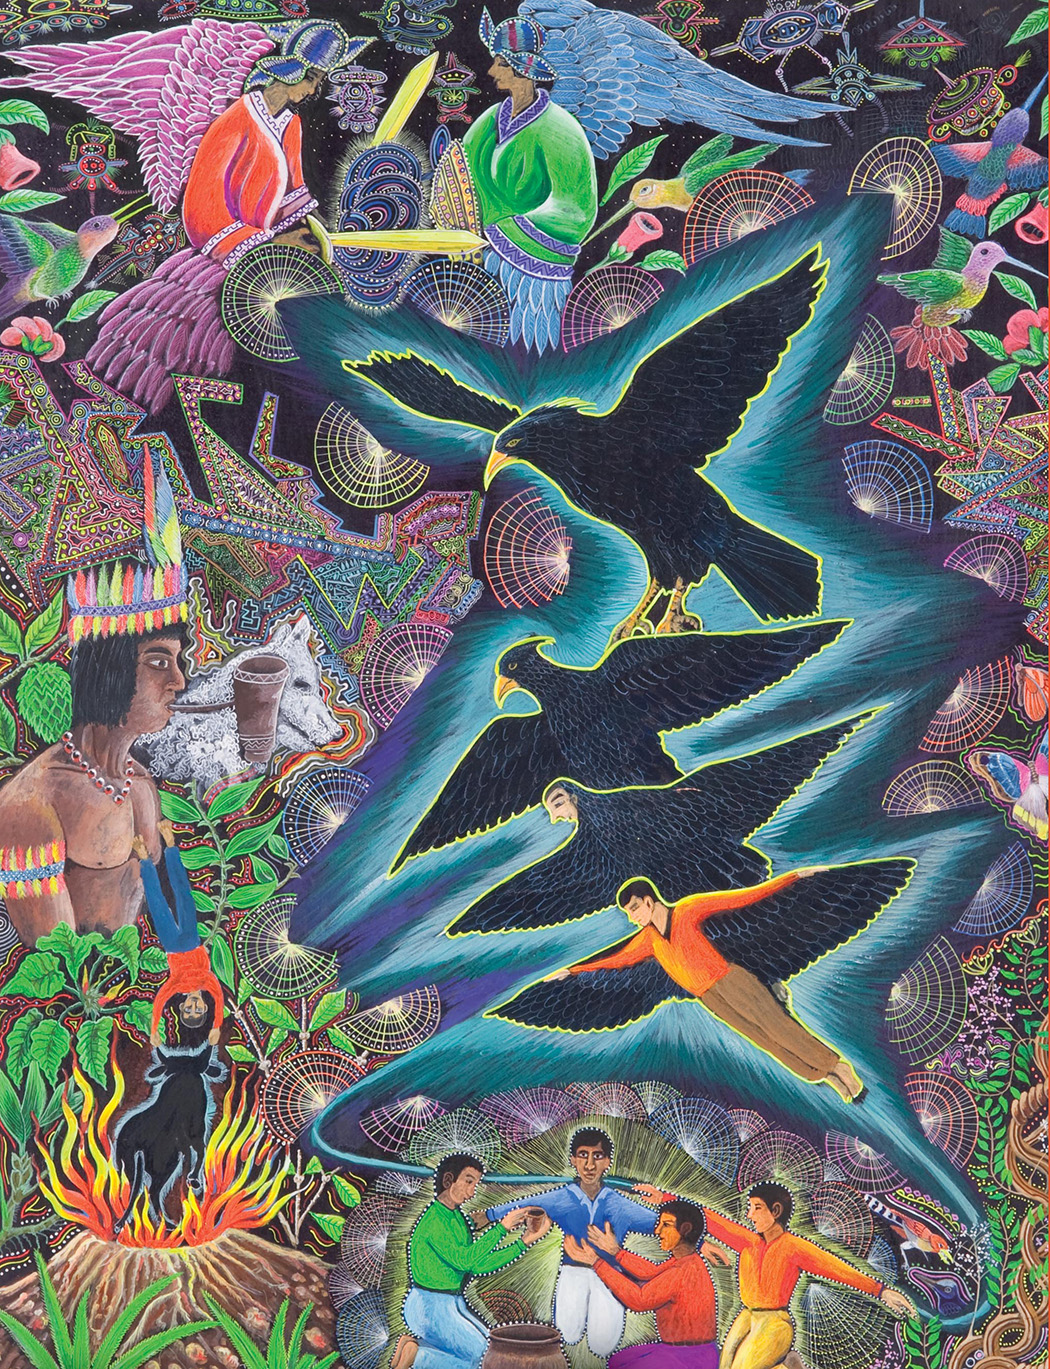 Illustration of an Ayahuasca visual by Pablo Amaringo